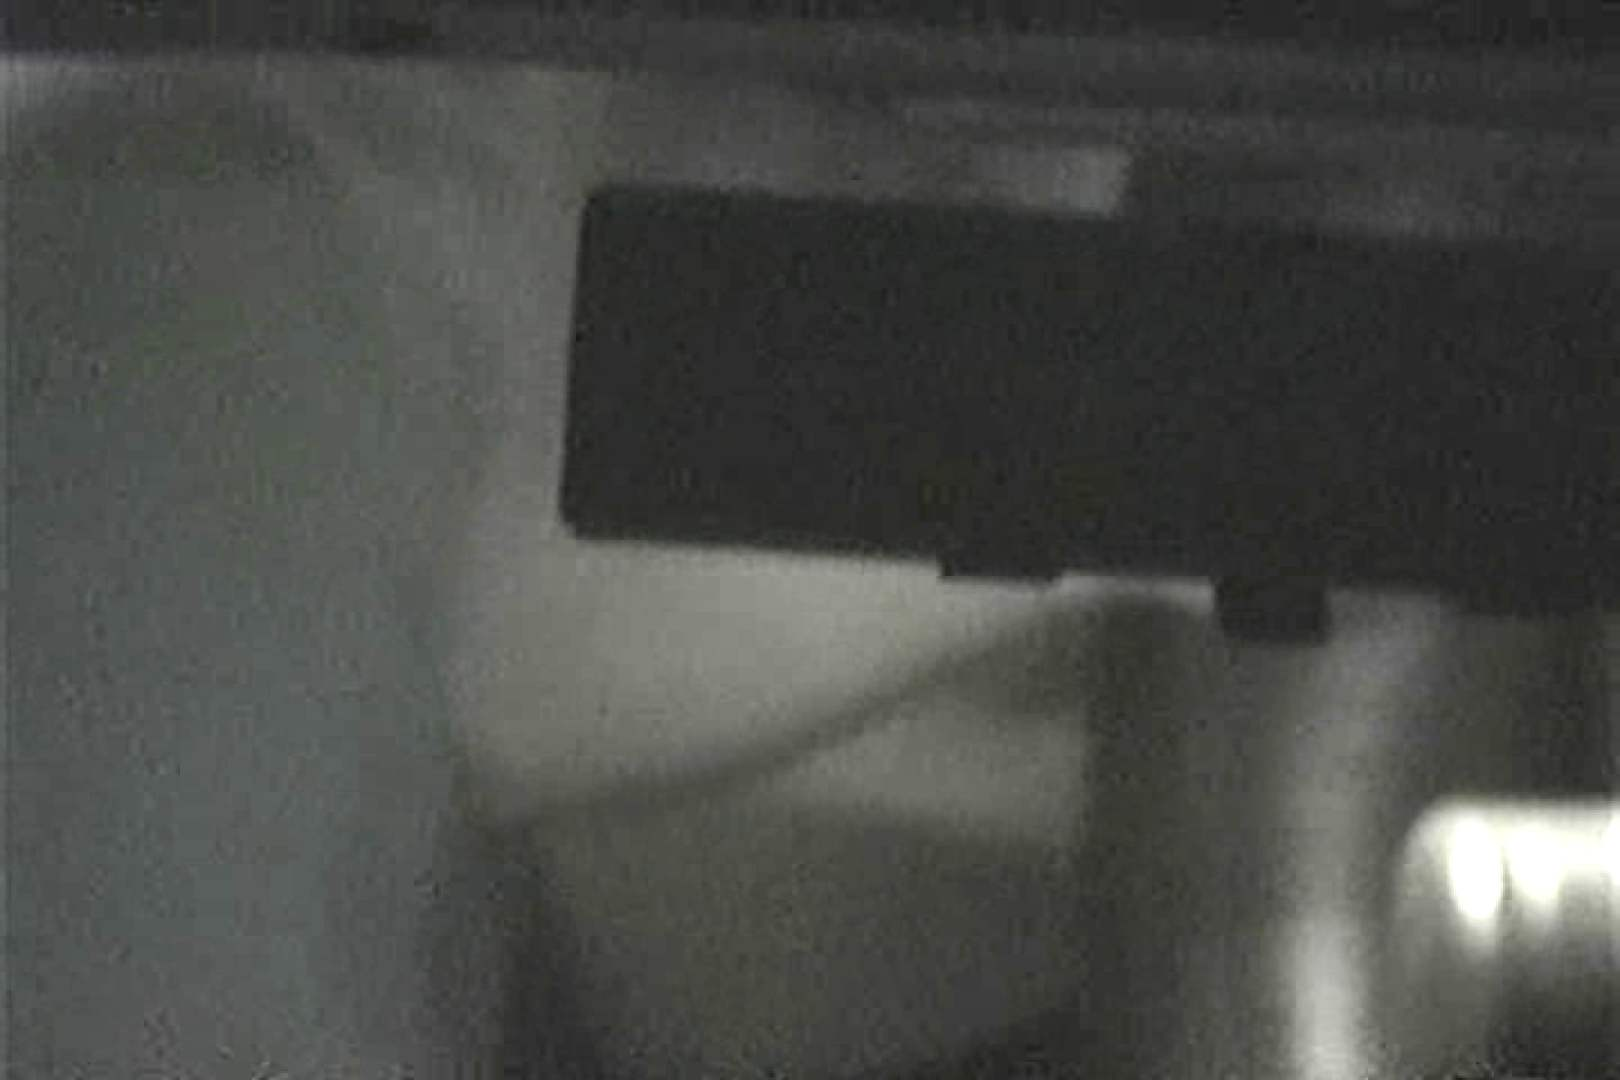 MASAさんの待ち伏せ撮り! 赤外線カーセックスVol.17 セックス AV無料動画キャプチャ 70pic 13